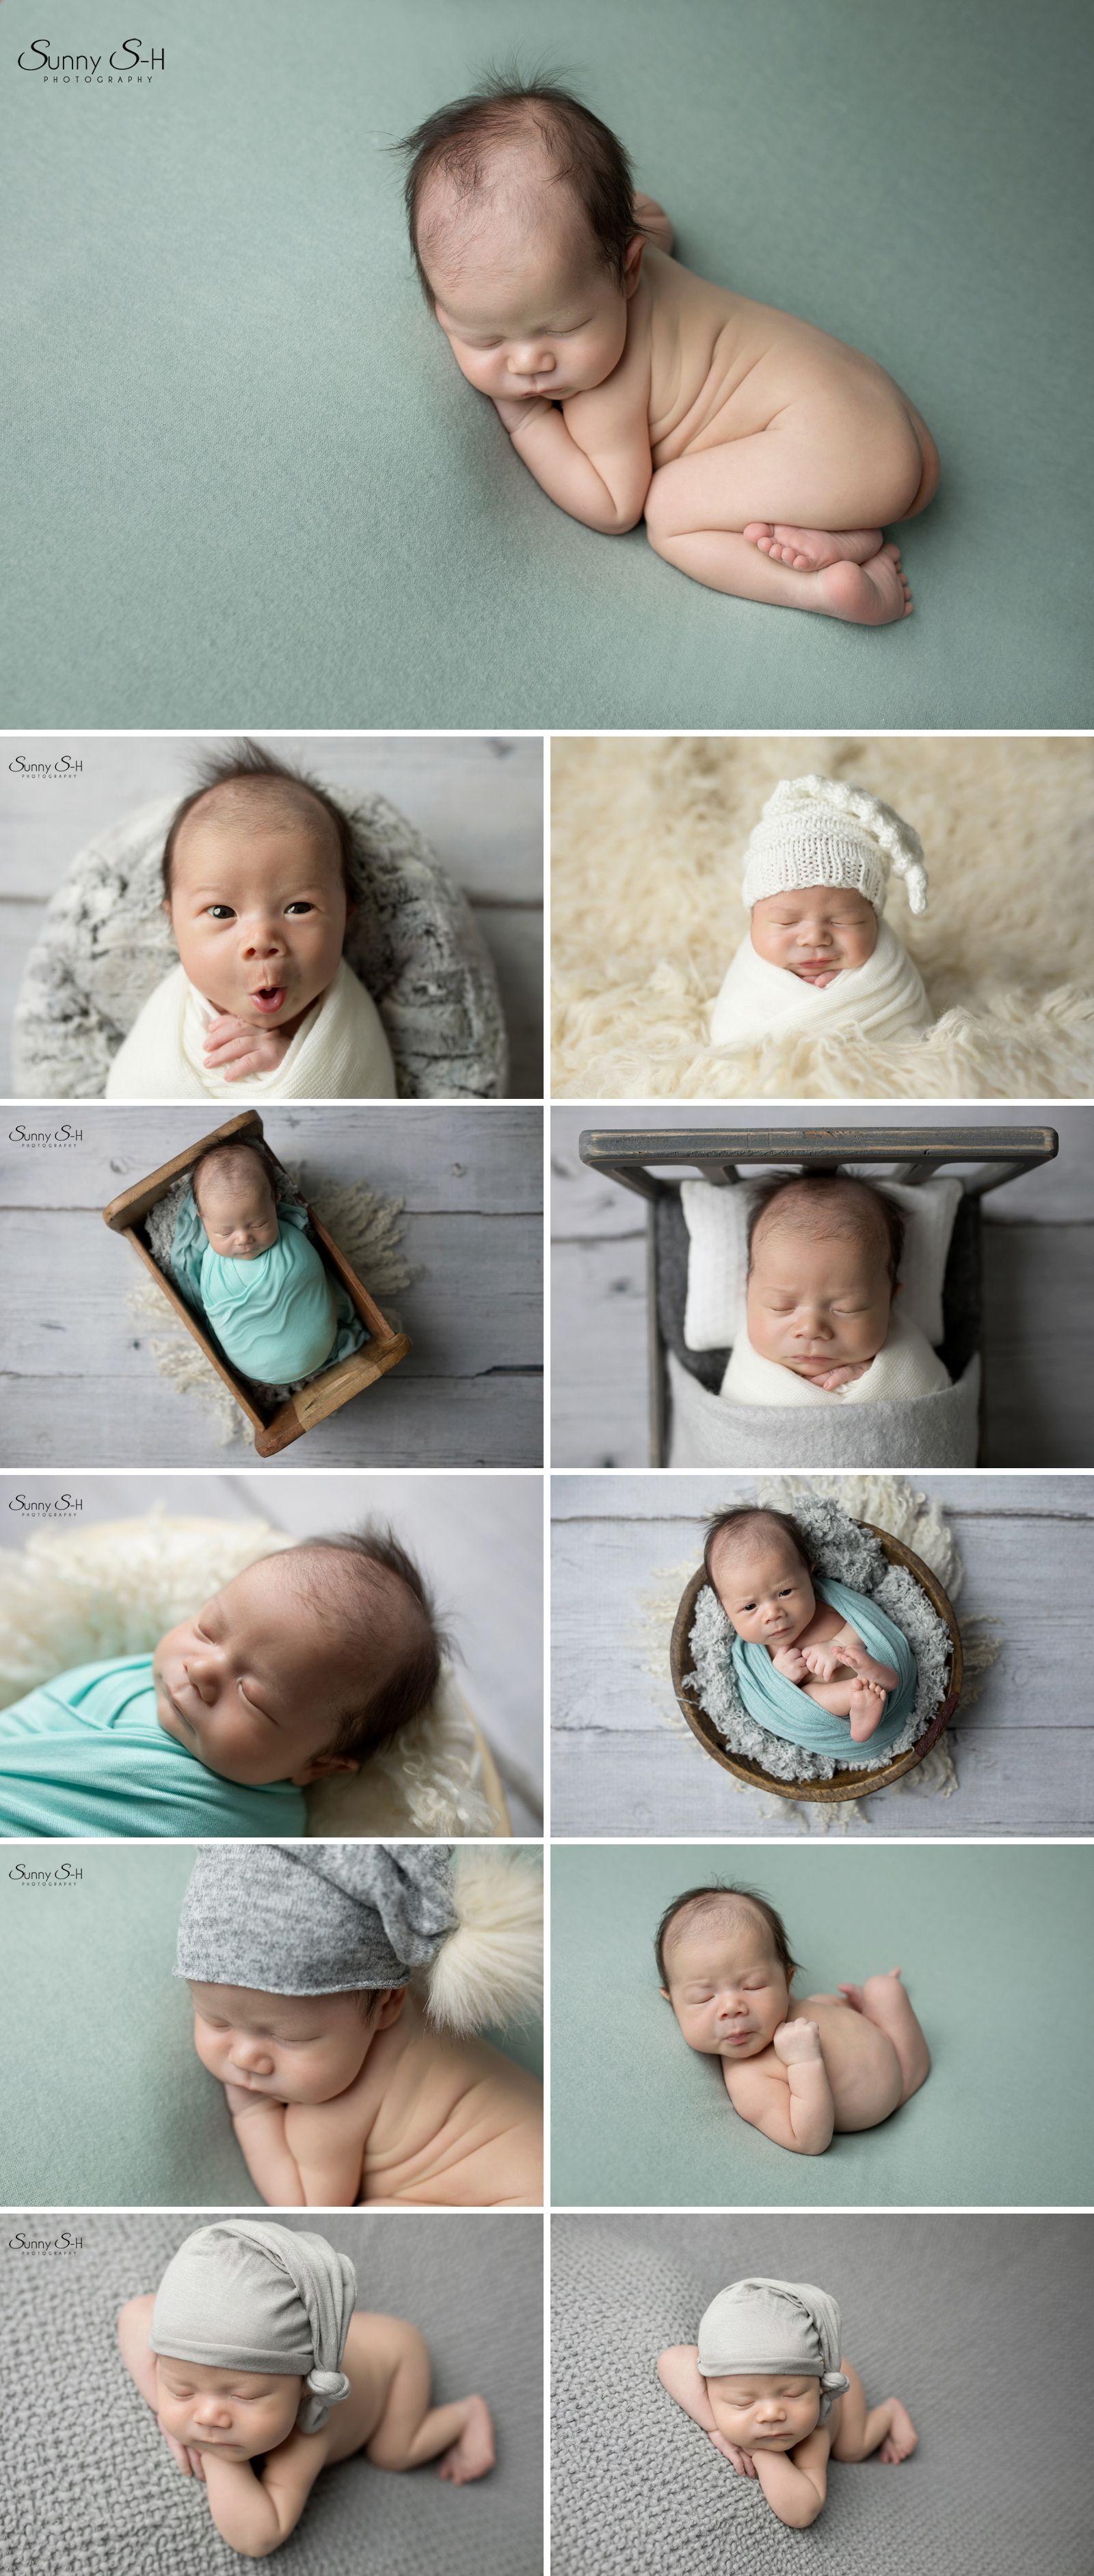 4 week old newborn photo shoot in studio with sunny s h photography winnipeg